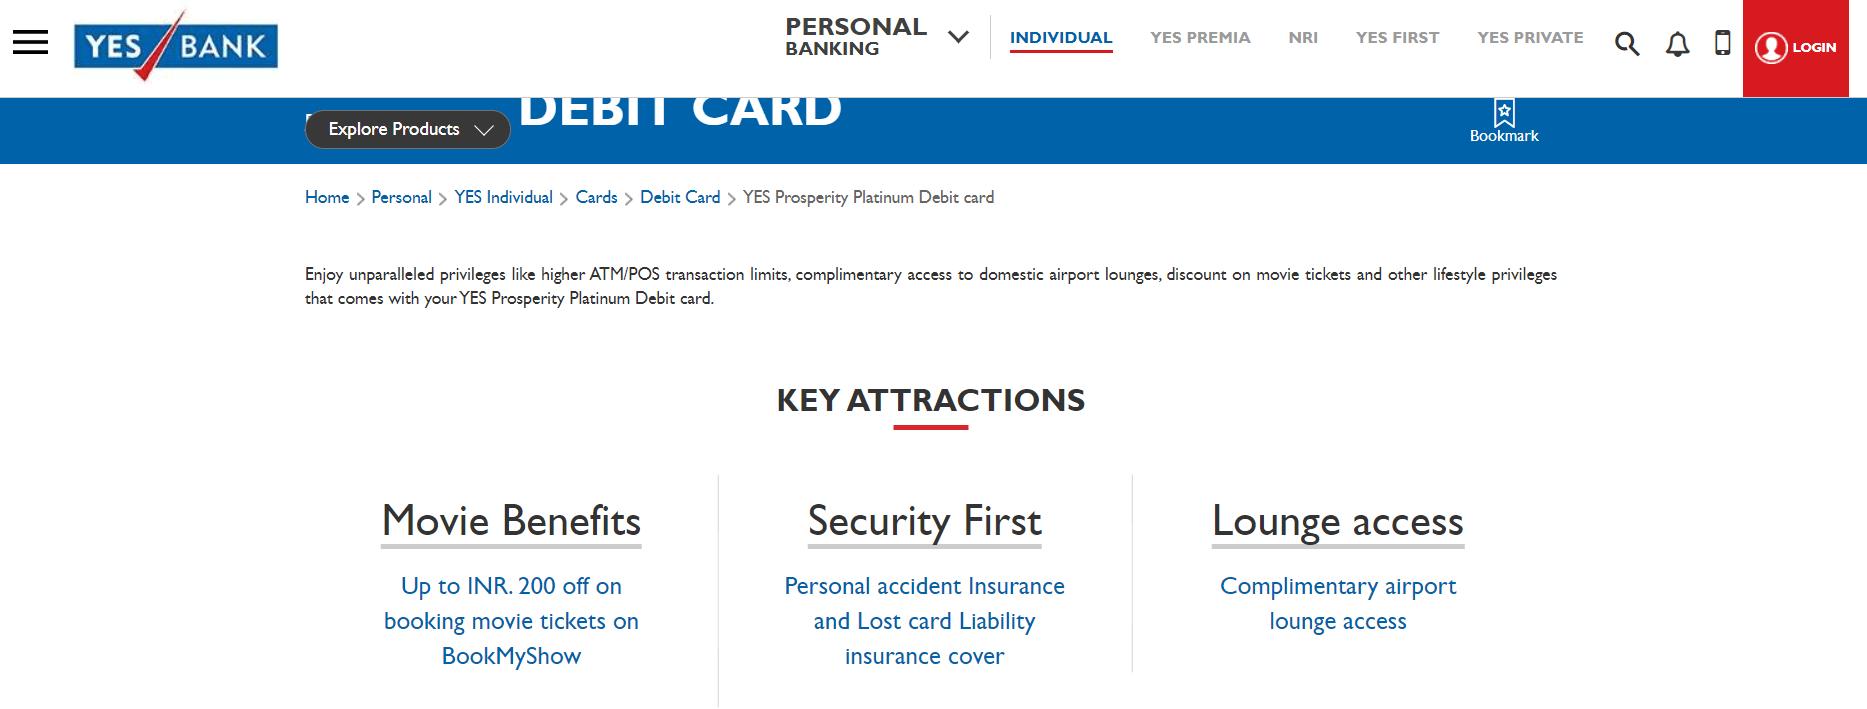 Yes Bank Prosperity Platinum Debit Card